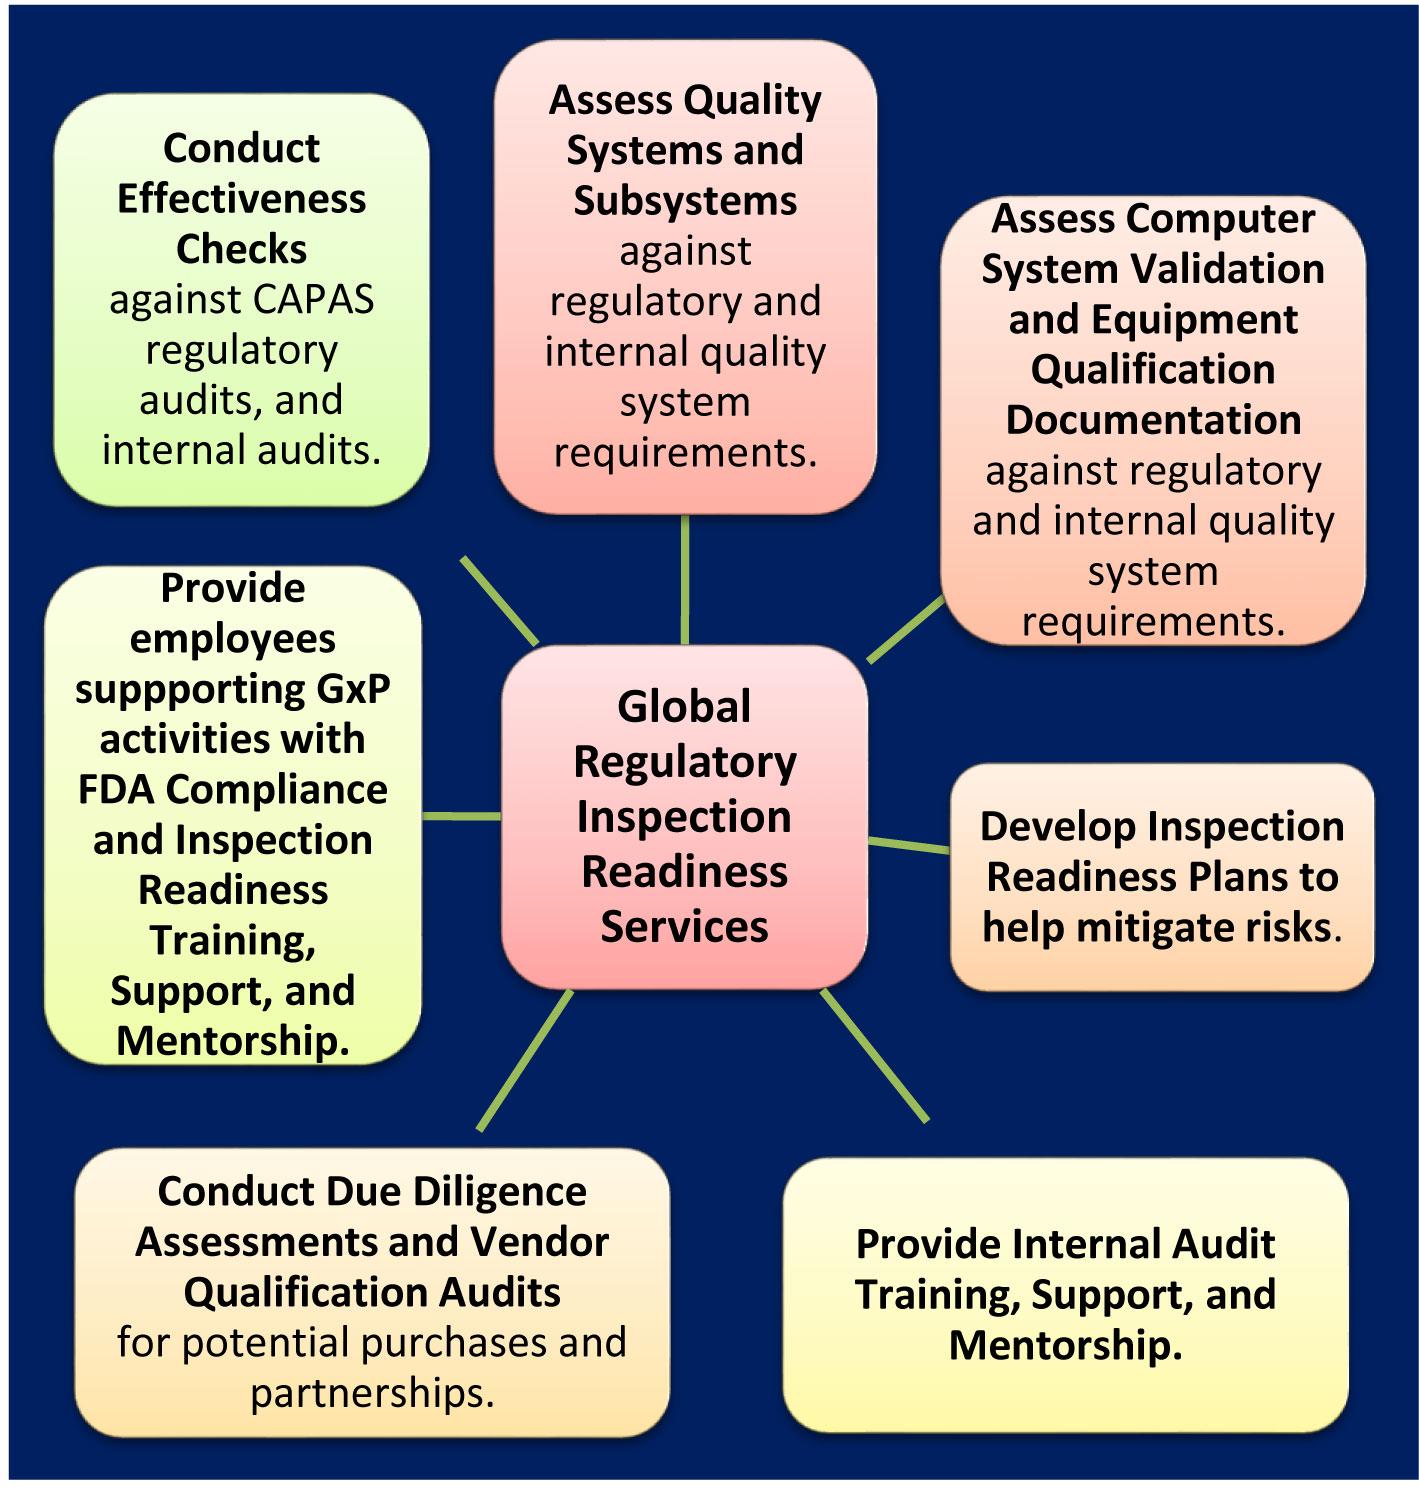 Global Regulatory Inspection Readiness Services - fdacompliancespecialists.com